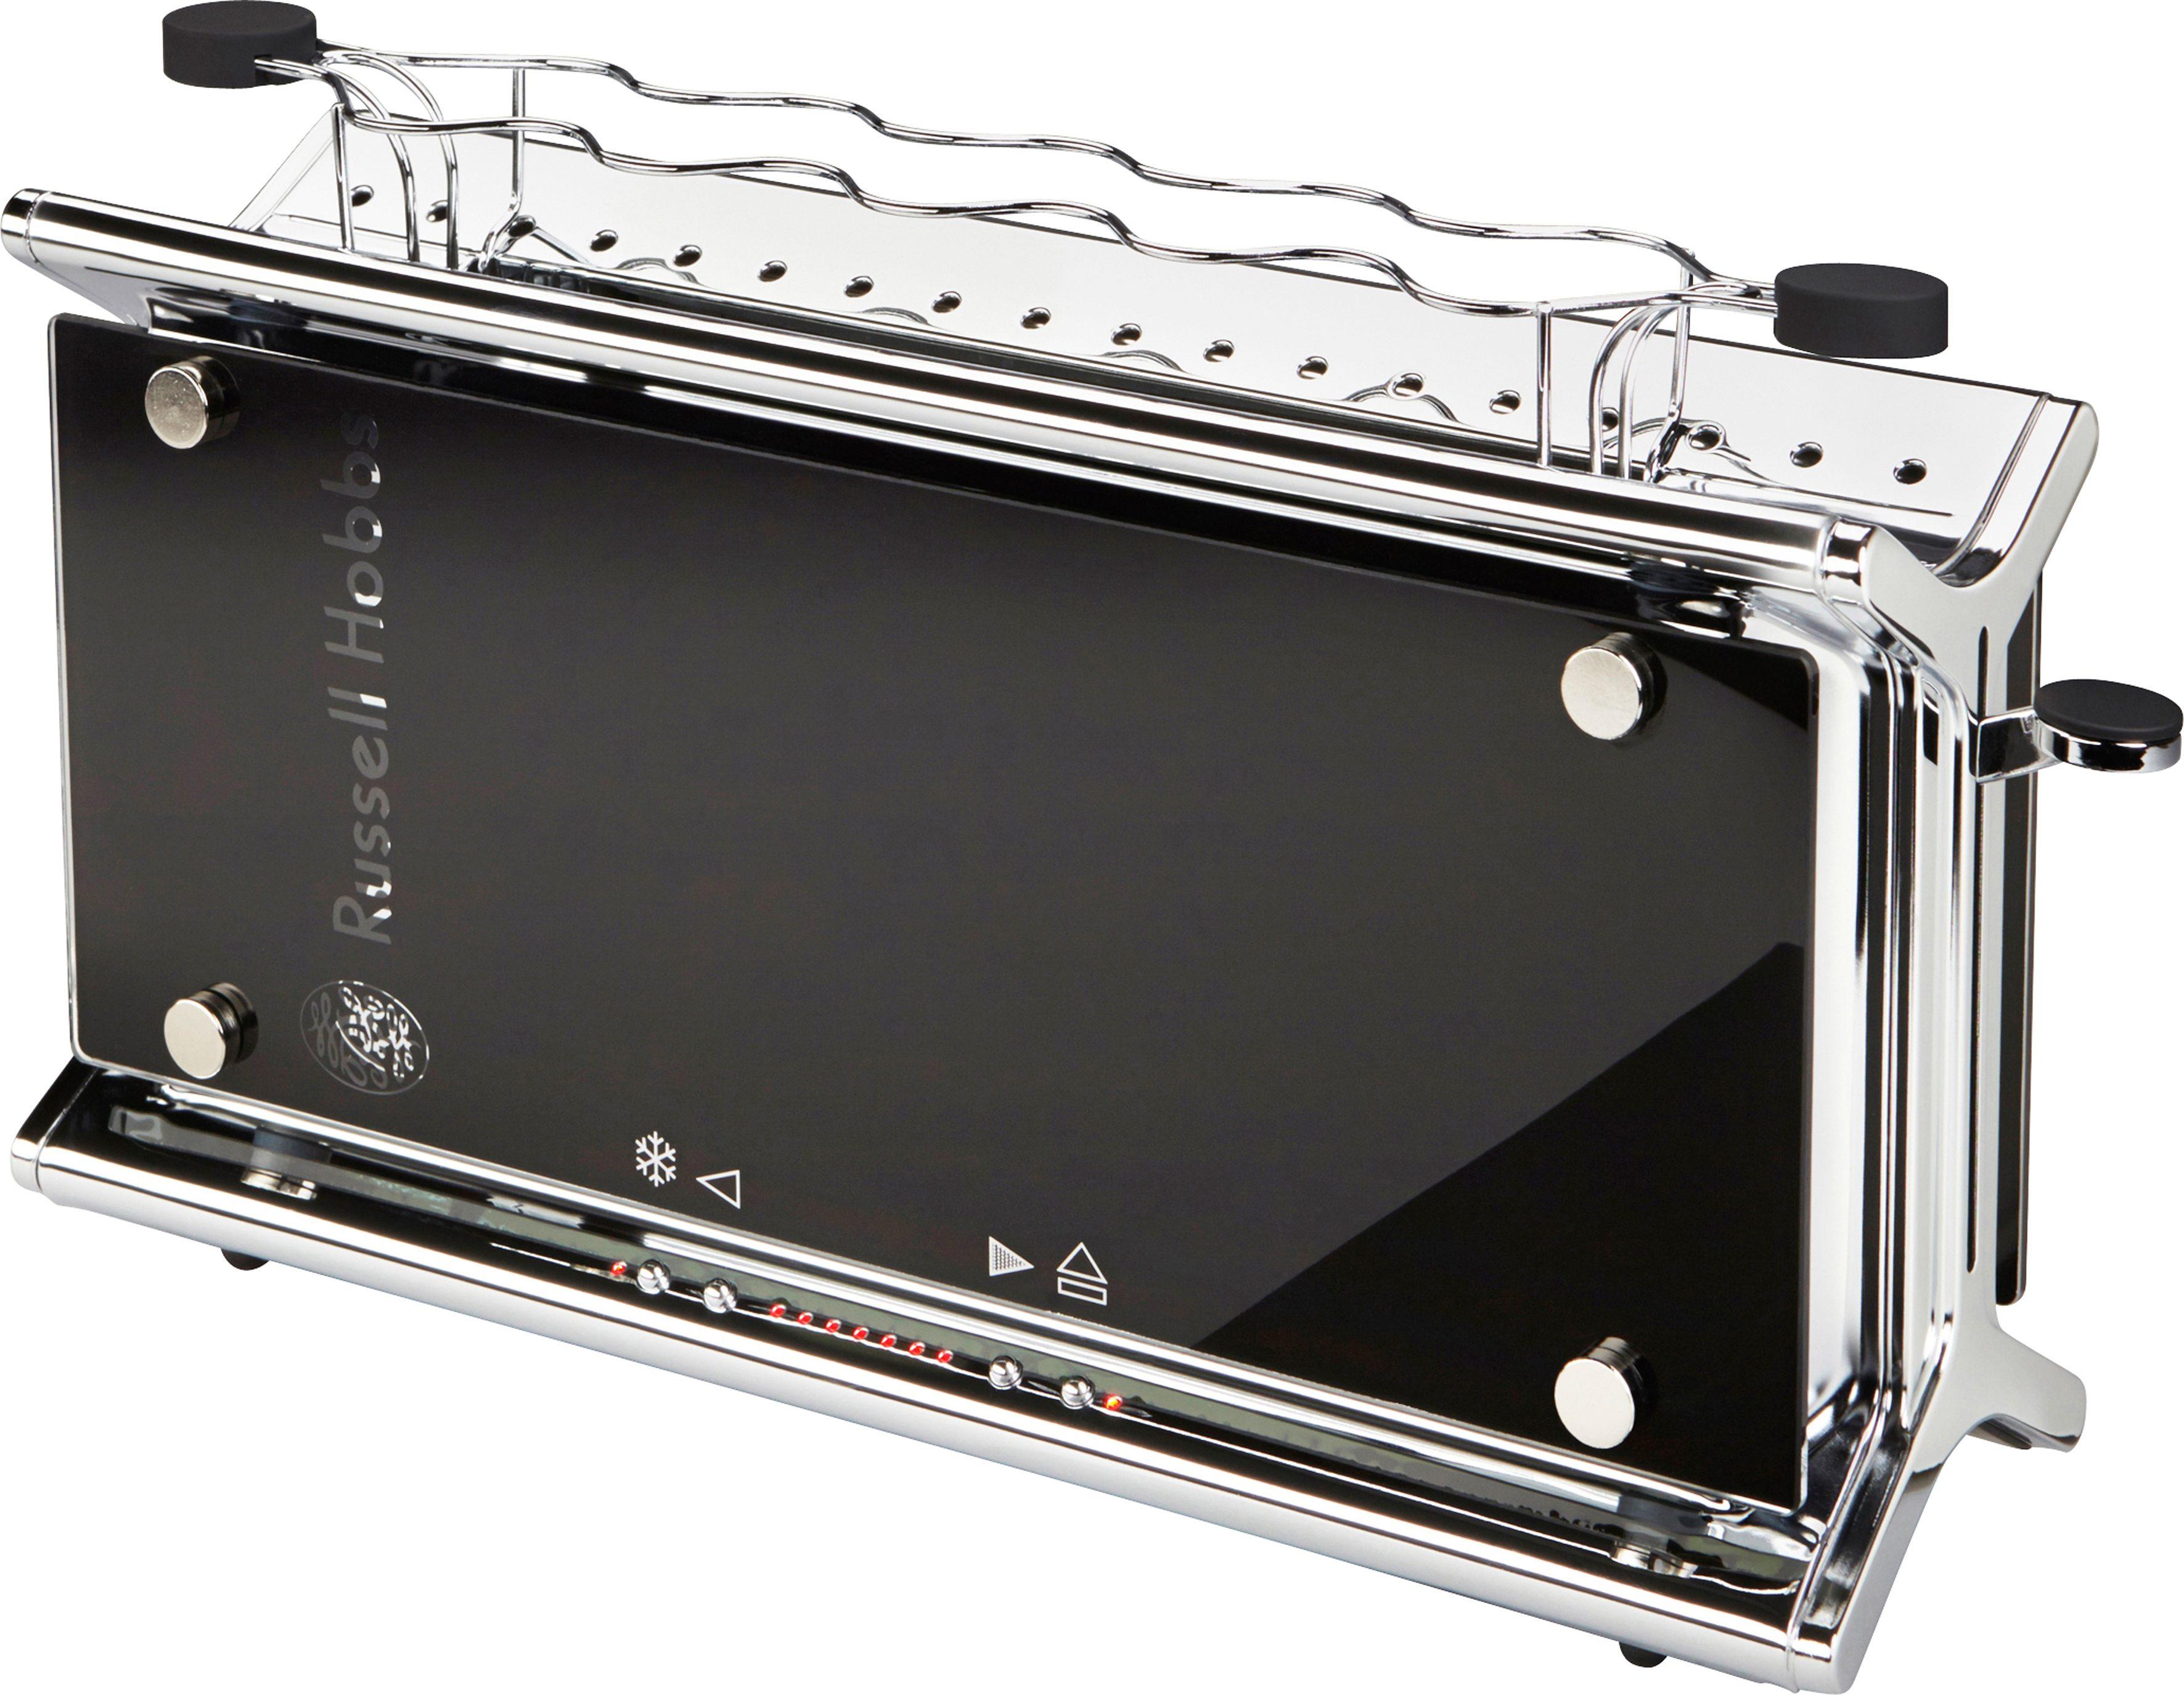 Russell Hobbs Langschlitz-Toaster »Black Glass« 20370-56, 1080 Watt, Edelstahl/Glas